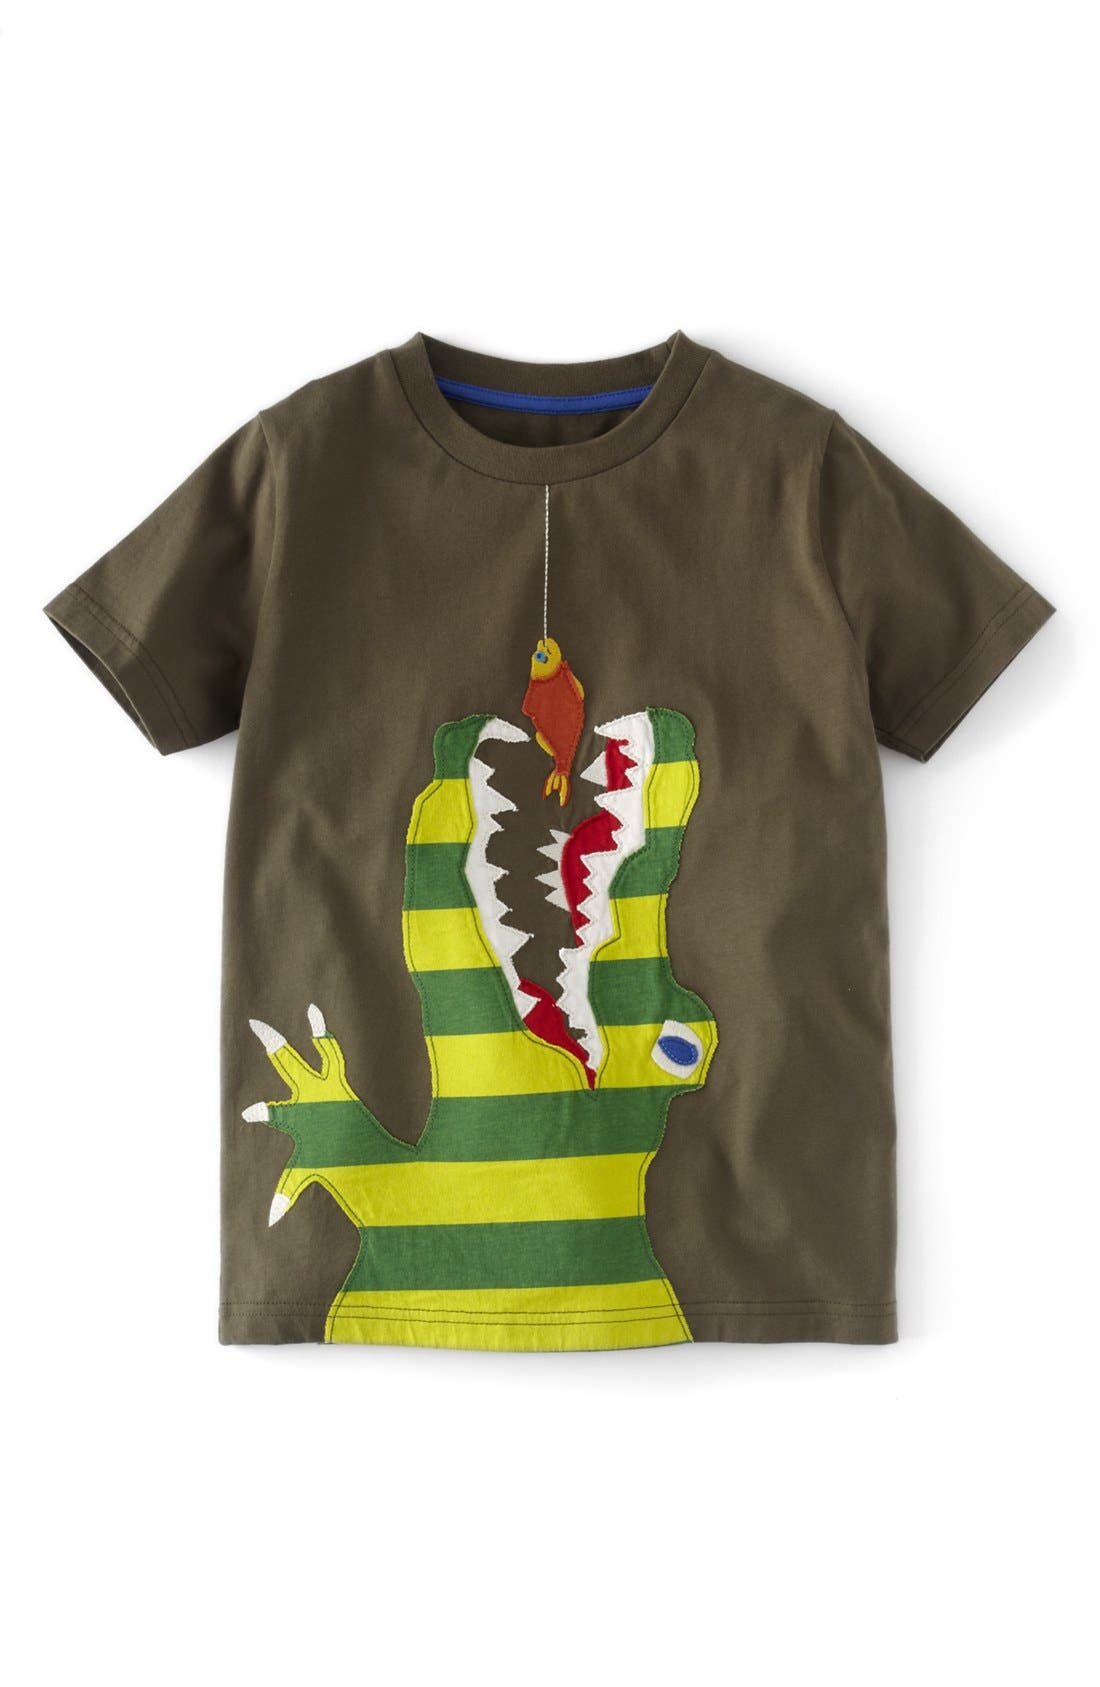 Alternate Image 1 Selected - Mini Boden 'Big Appliqué' Short Sleeve T-Shirt (Toddler Boys, Little Boys & Big Boys)